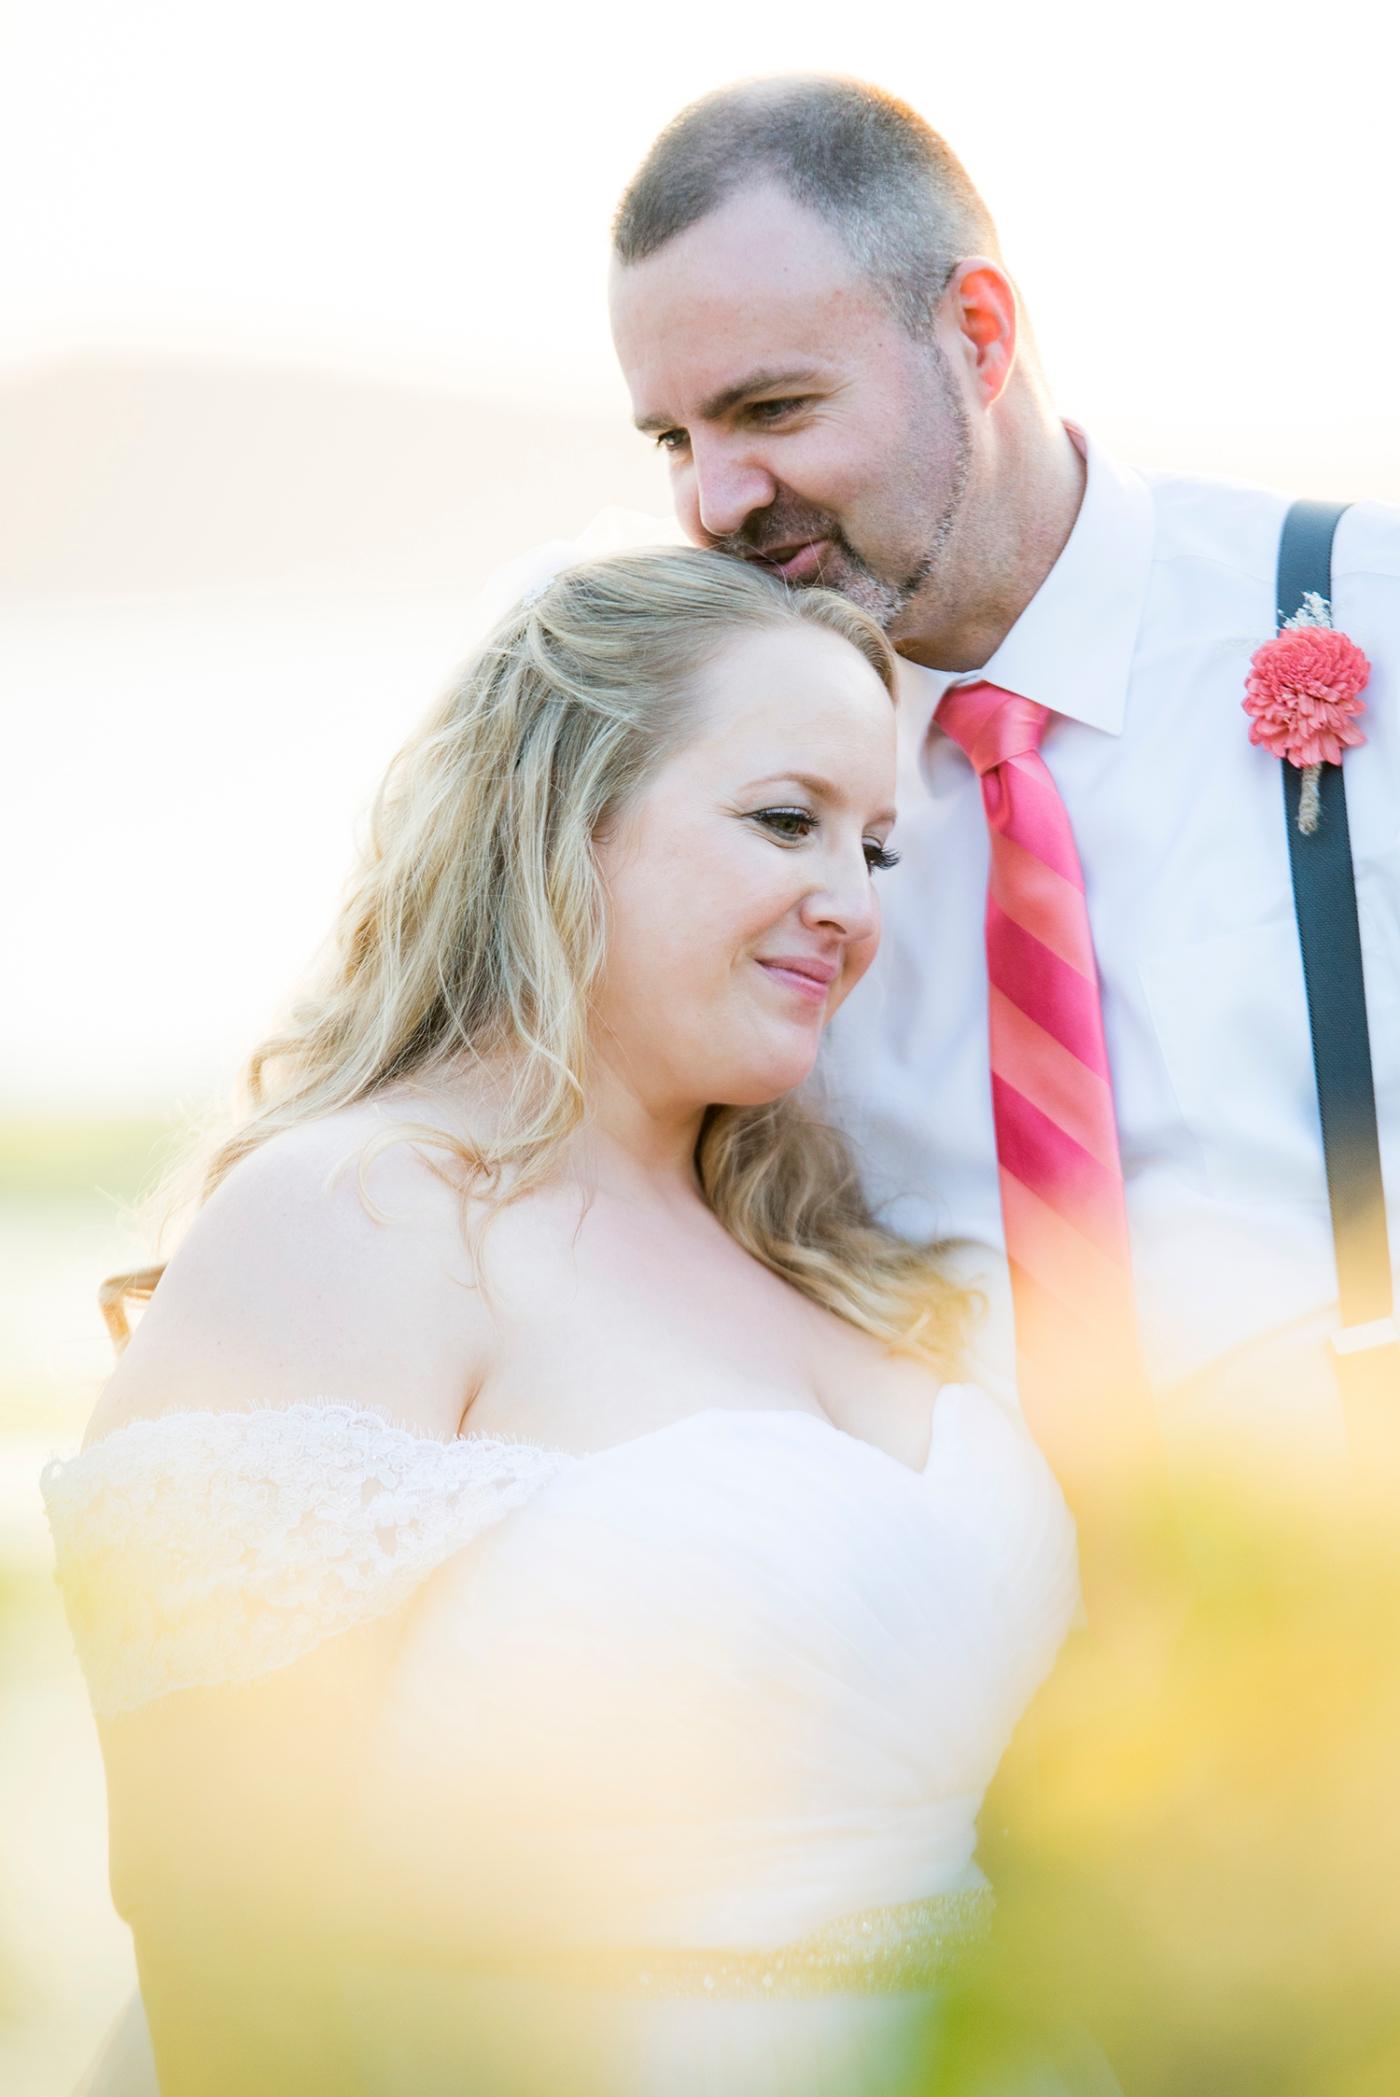 Jane_Speleers_photography_Kadie_and_Steve_2016_Des_Moines_Marina_WeddingDSC_2399